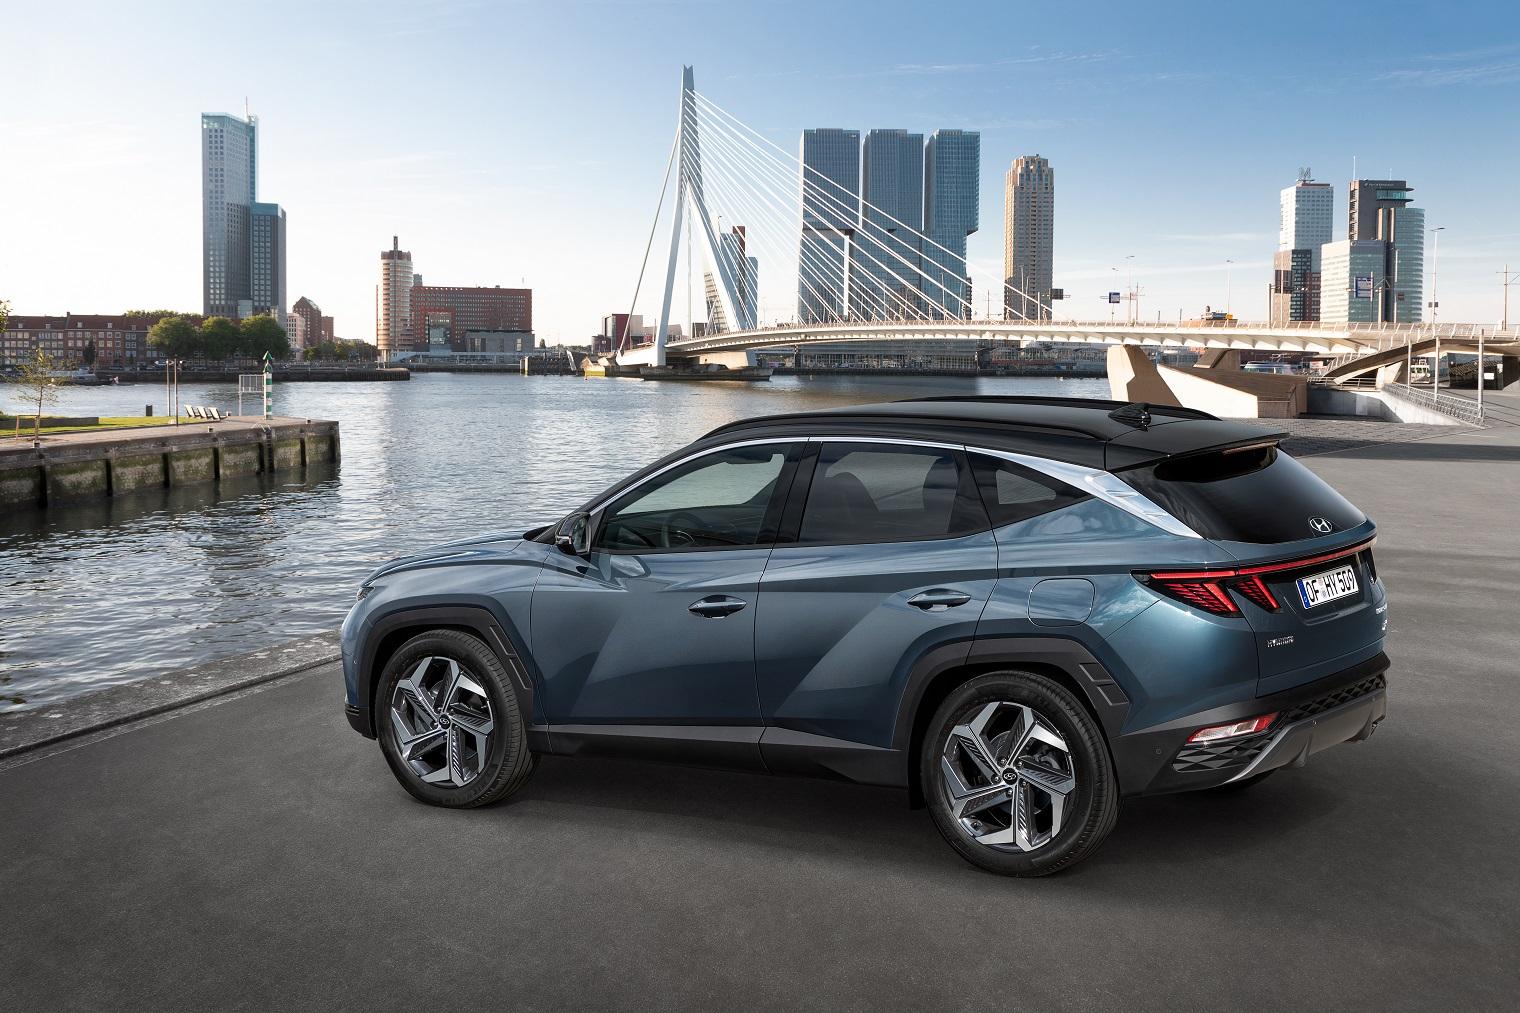 esterni nuova Hyundai Tucson